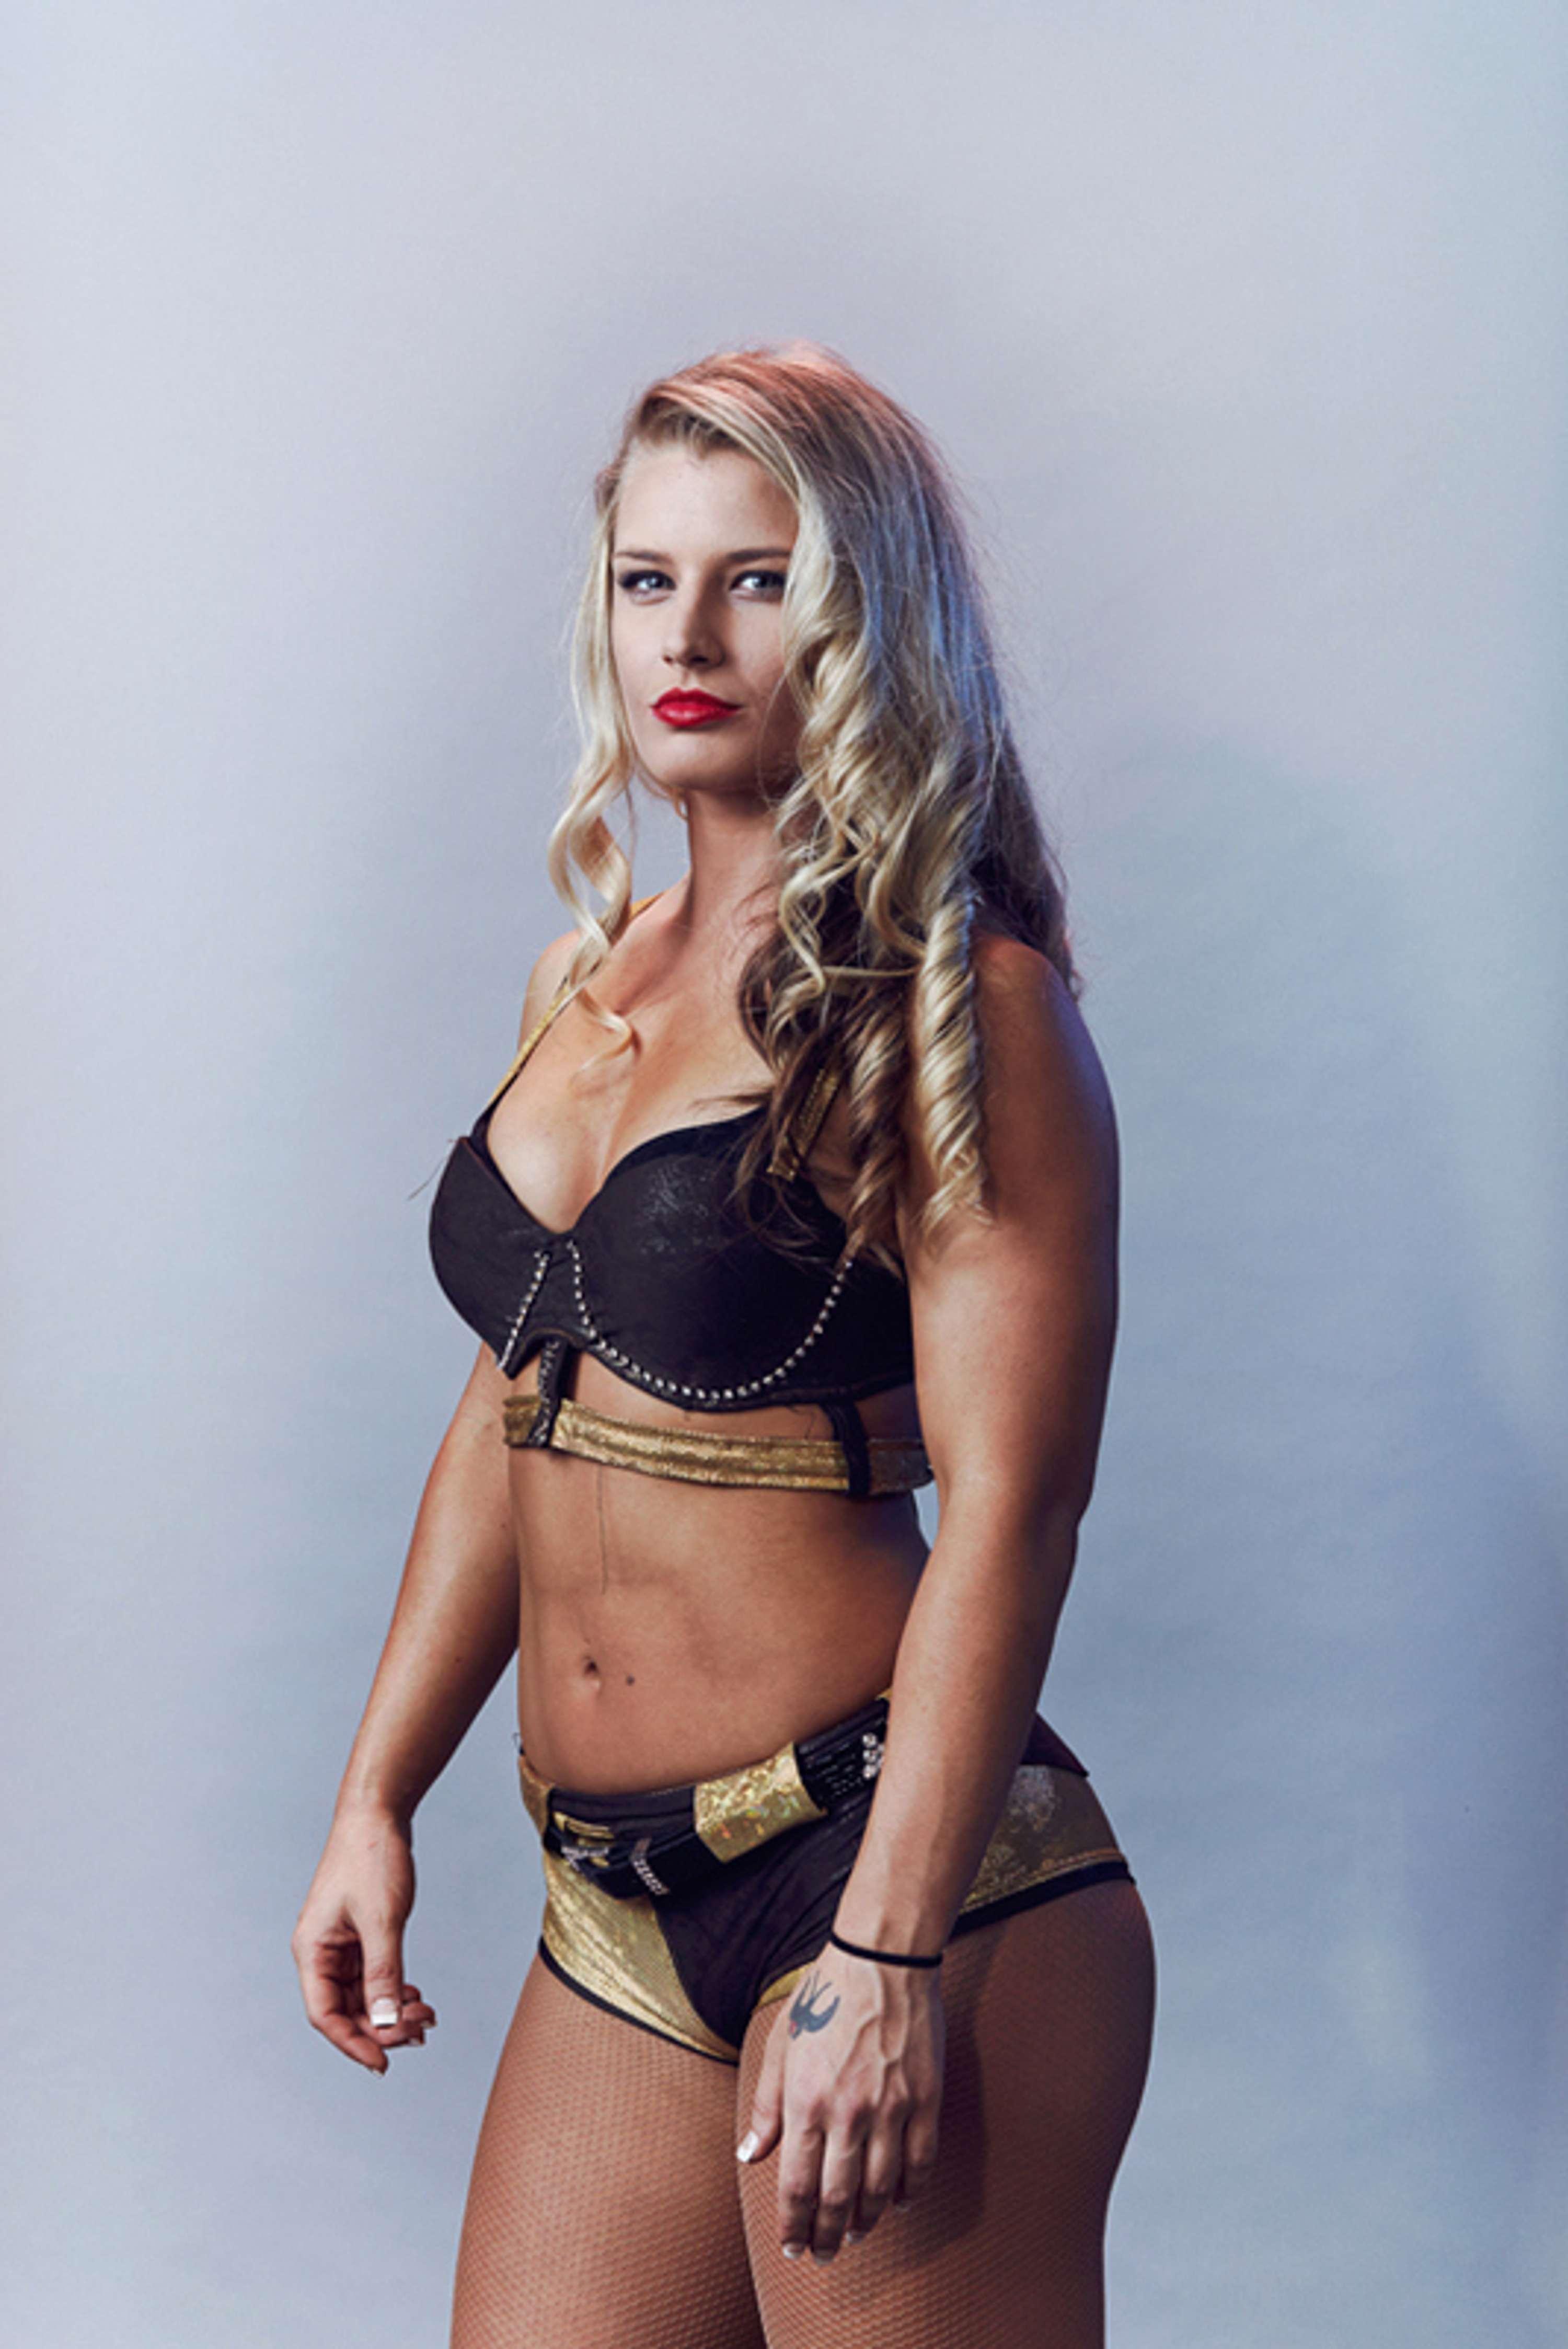 UK Female Wrestlers | The Dots